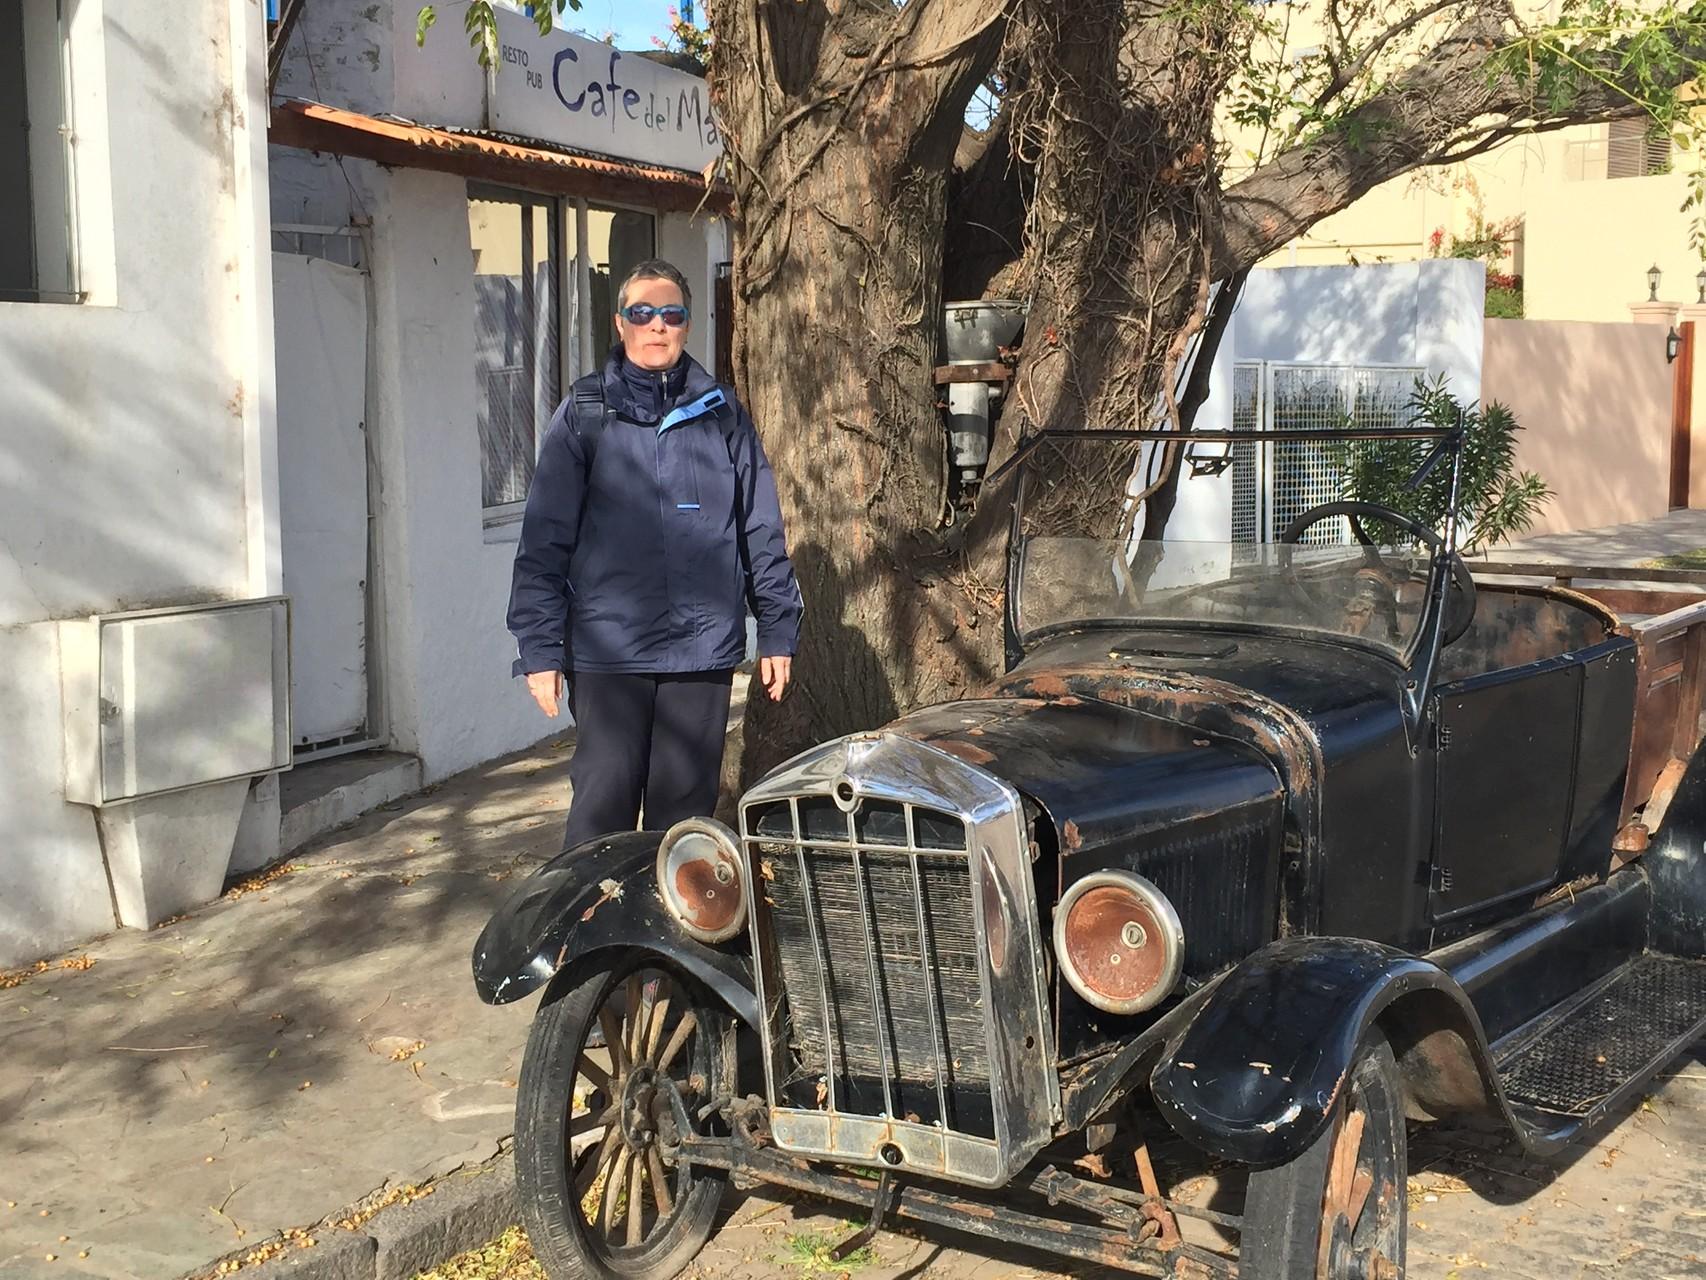 Überall alte Autos in Uruguay